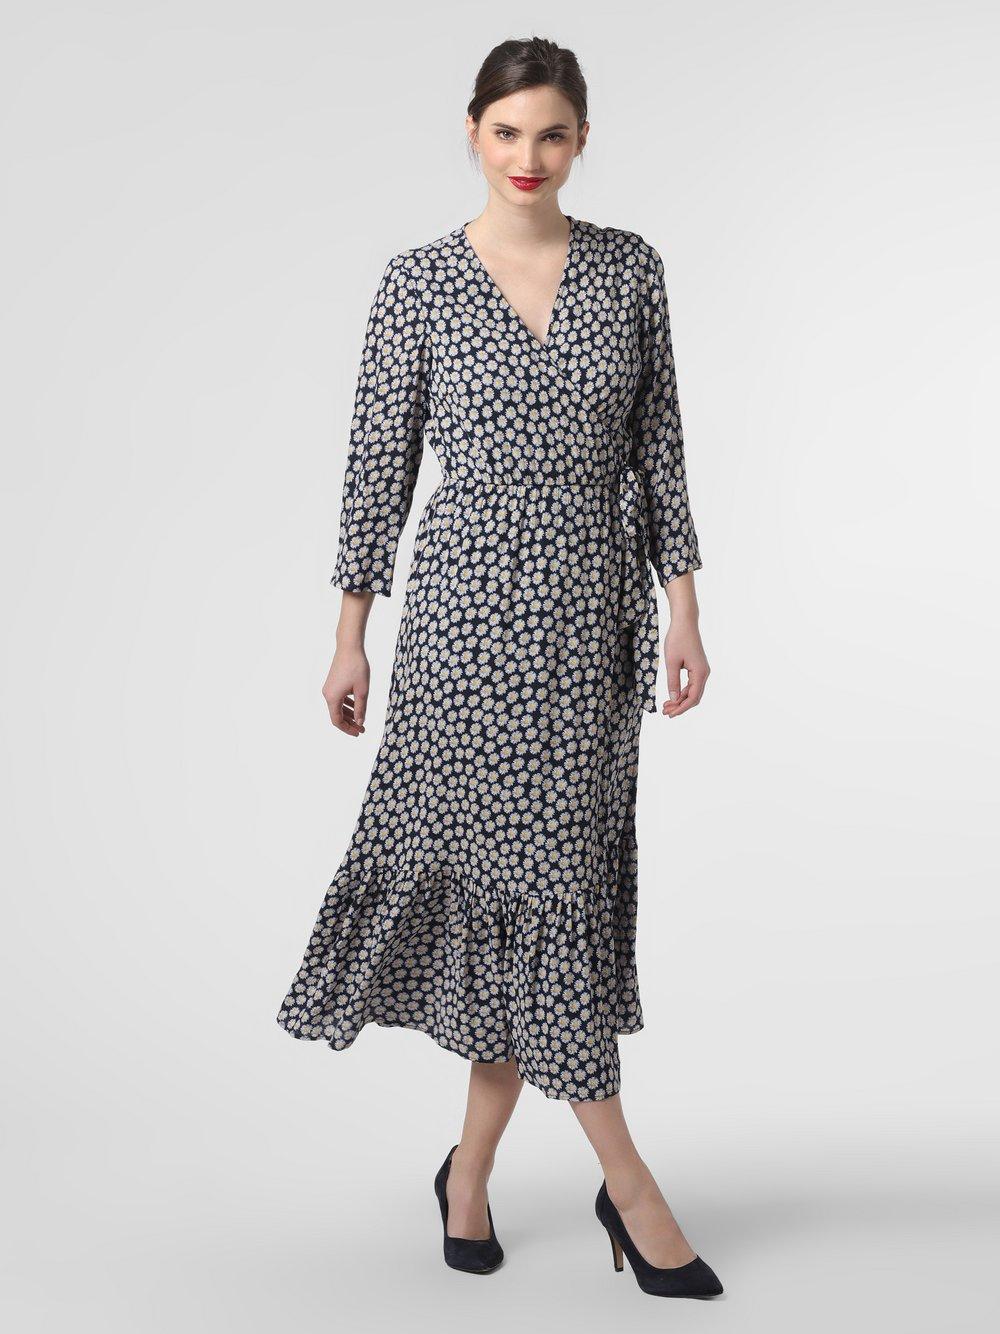 Y.A.S – Sukienka damska – Yasdaisy, niebieski Van Graaf 474290-0001-09900